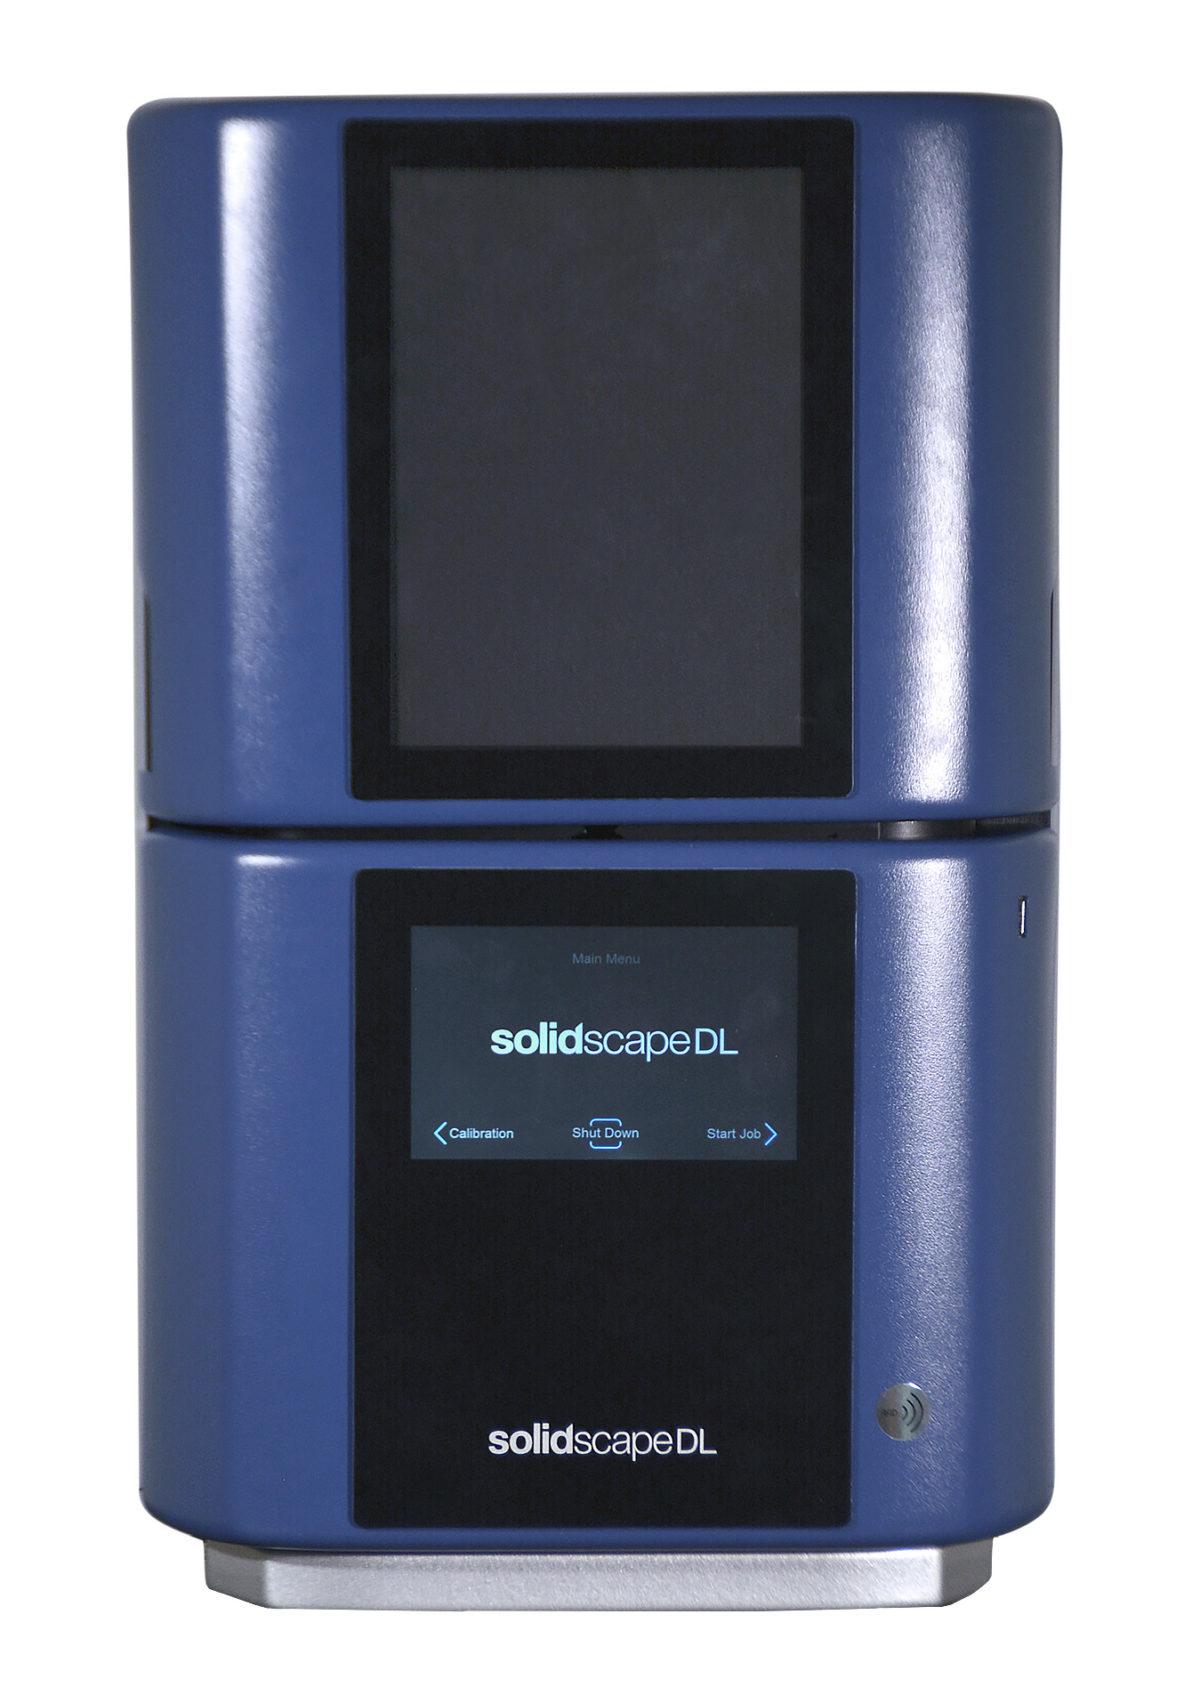 SoldiscapeDL Solidscape - 3D printers